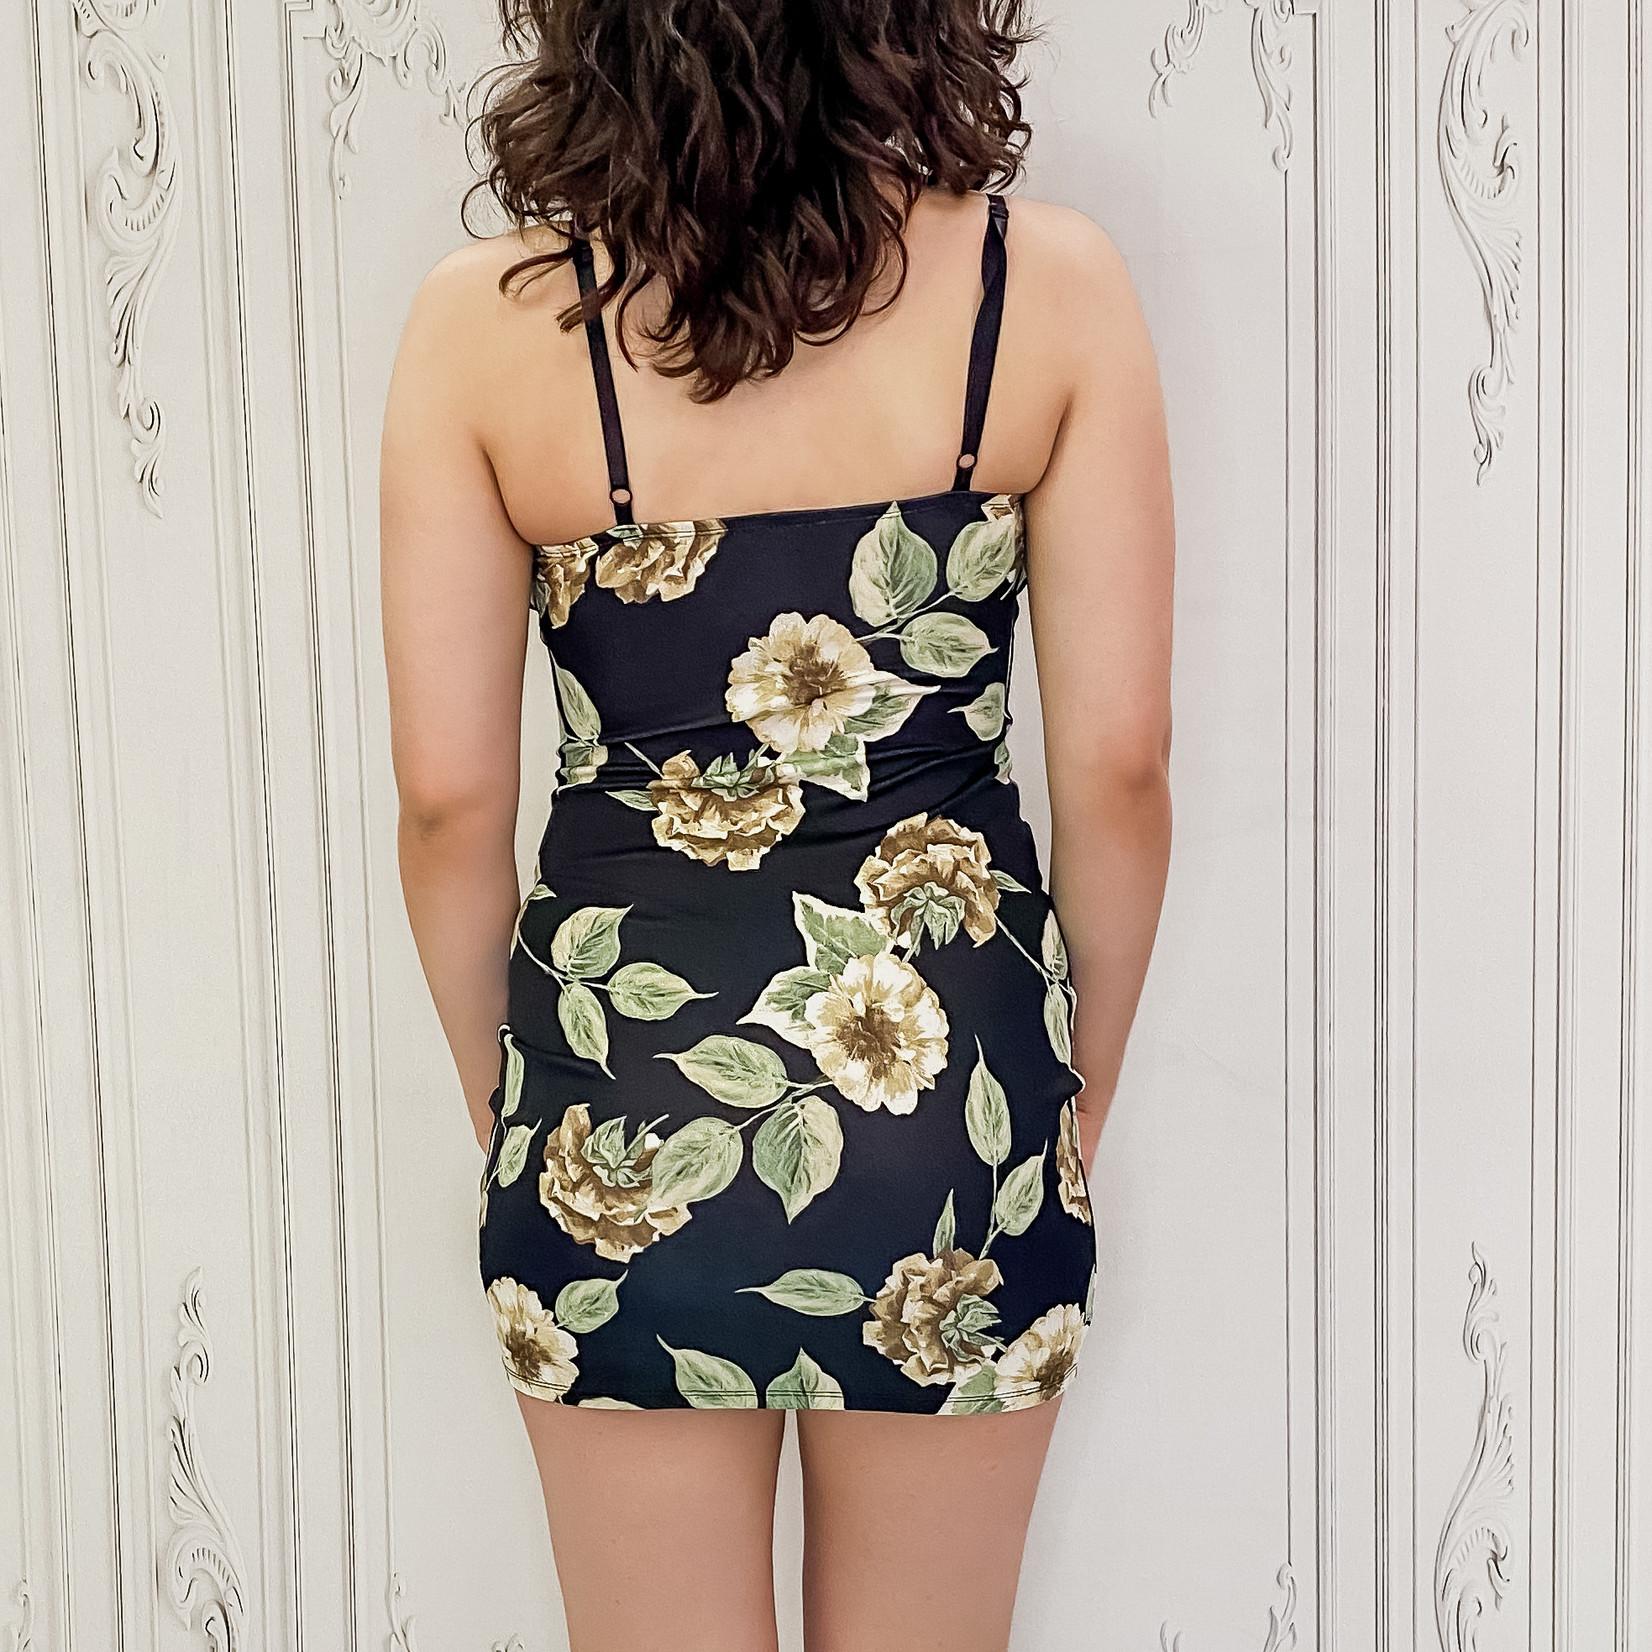 Jessie deep V floral fitted dress